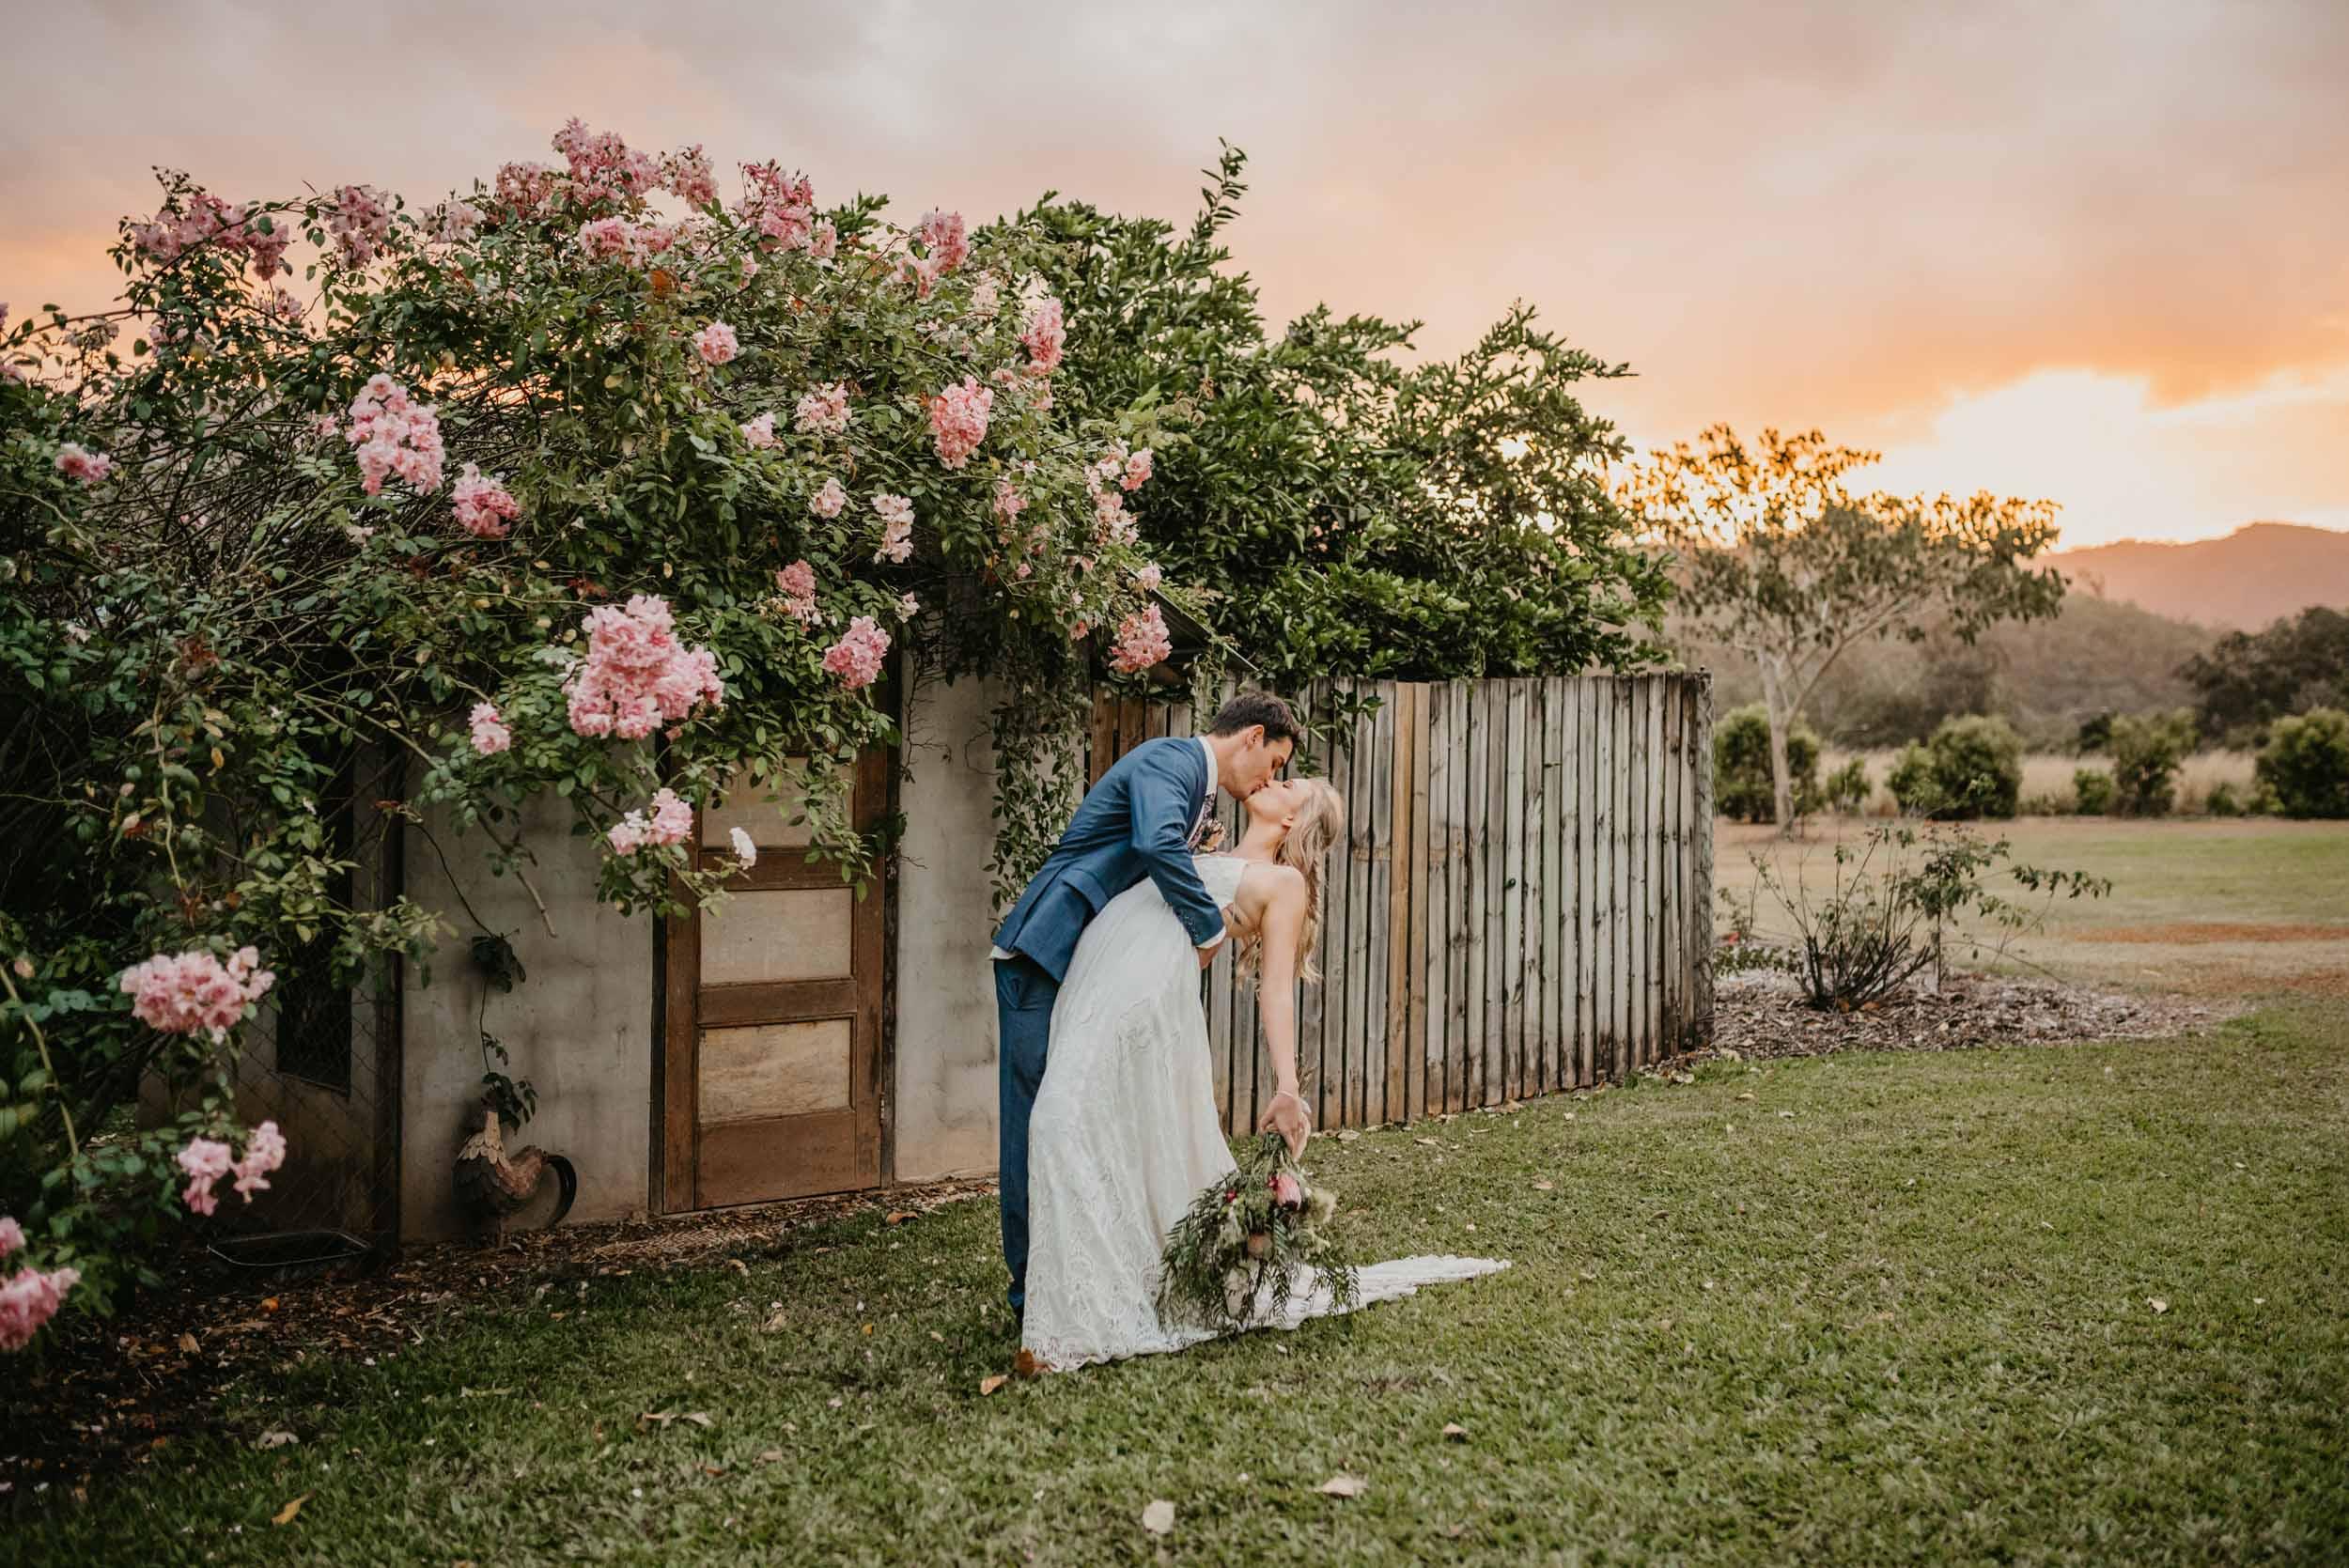 The Raw Photographer - Cairns Wedding Photographer - Laloli - Cairns Garden Wedding - Wedding Dress-78.jpg